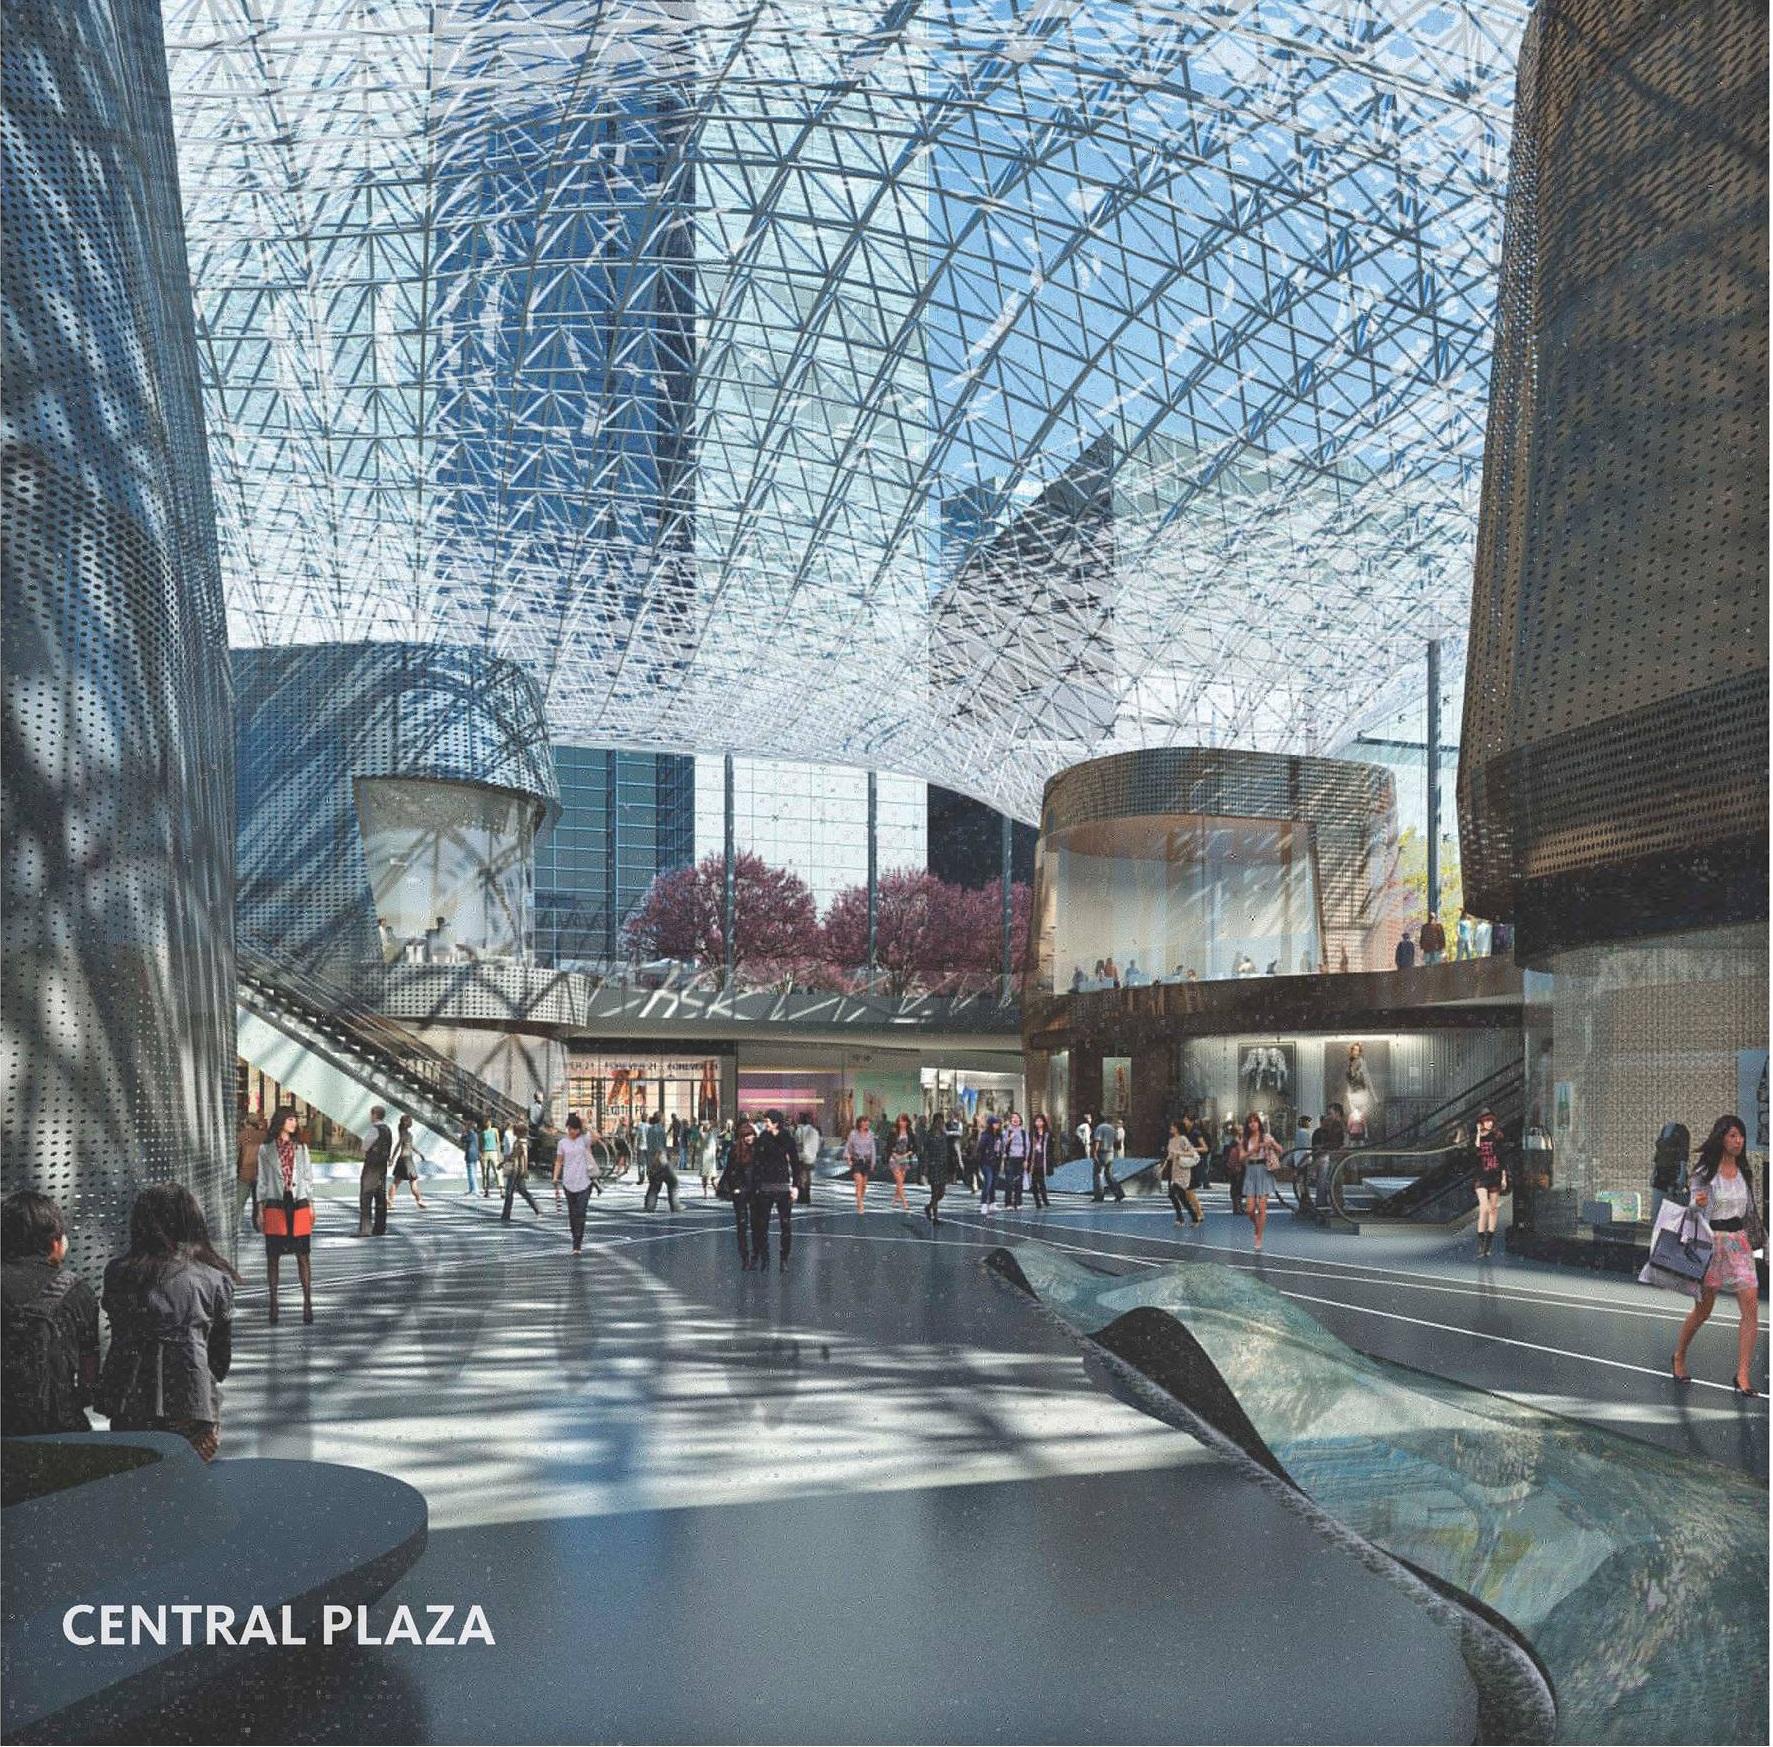 New Underground Shopping Mall Plus Added International Focus for Coex